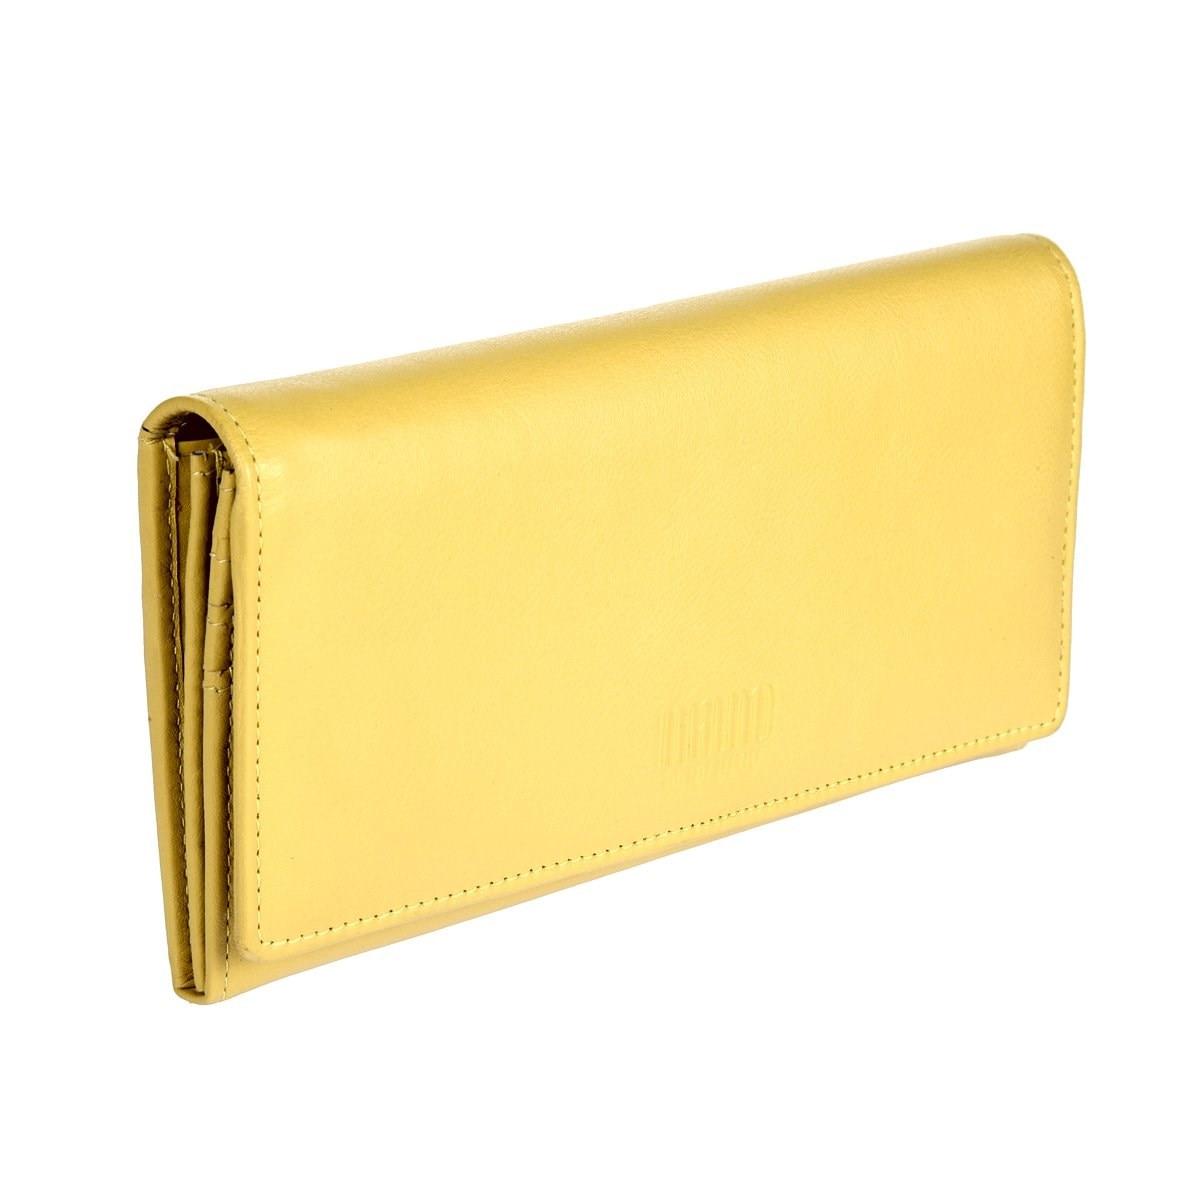 Purse Mano 20100 SETRU yellow кошелек mano 20103 setru kobald blue